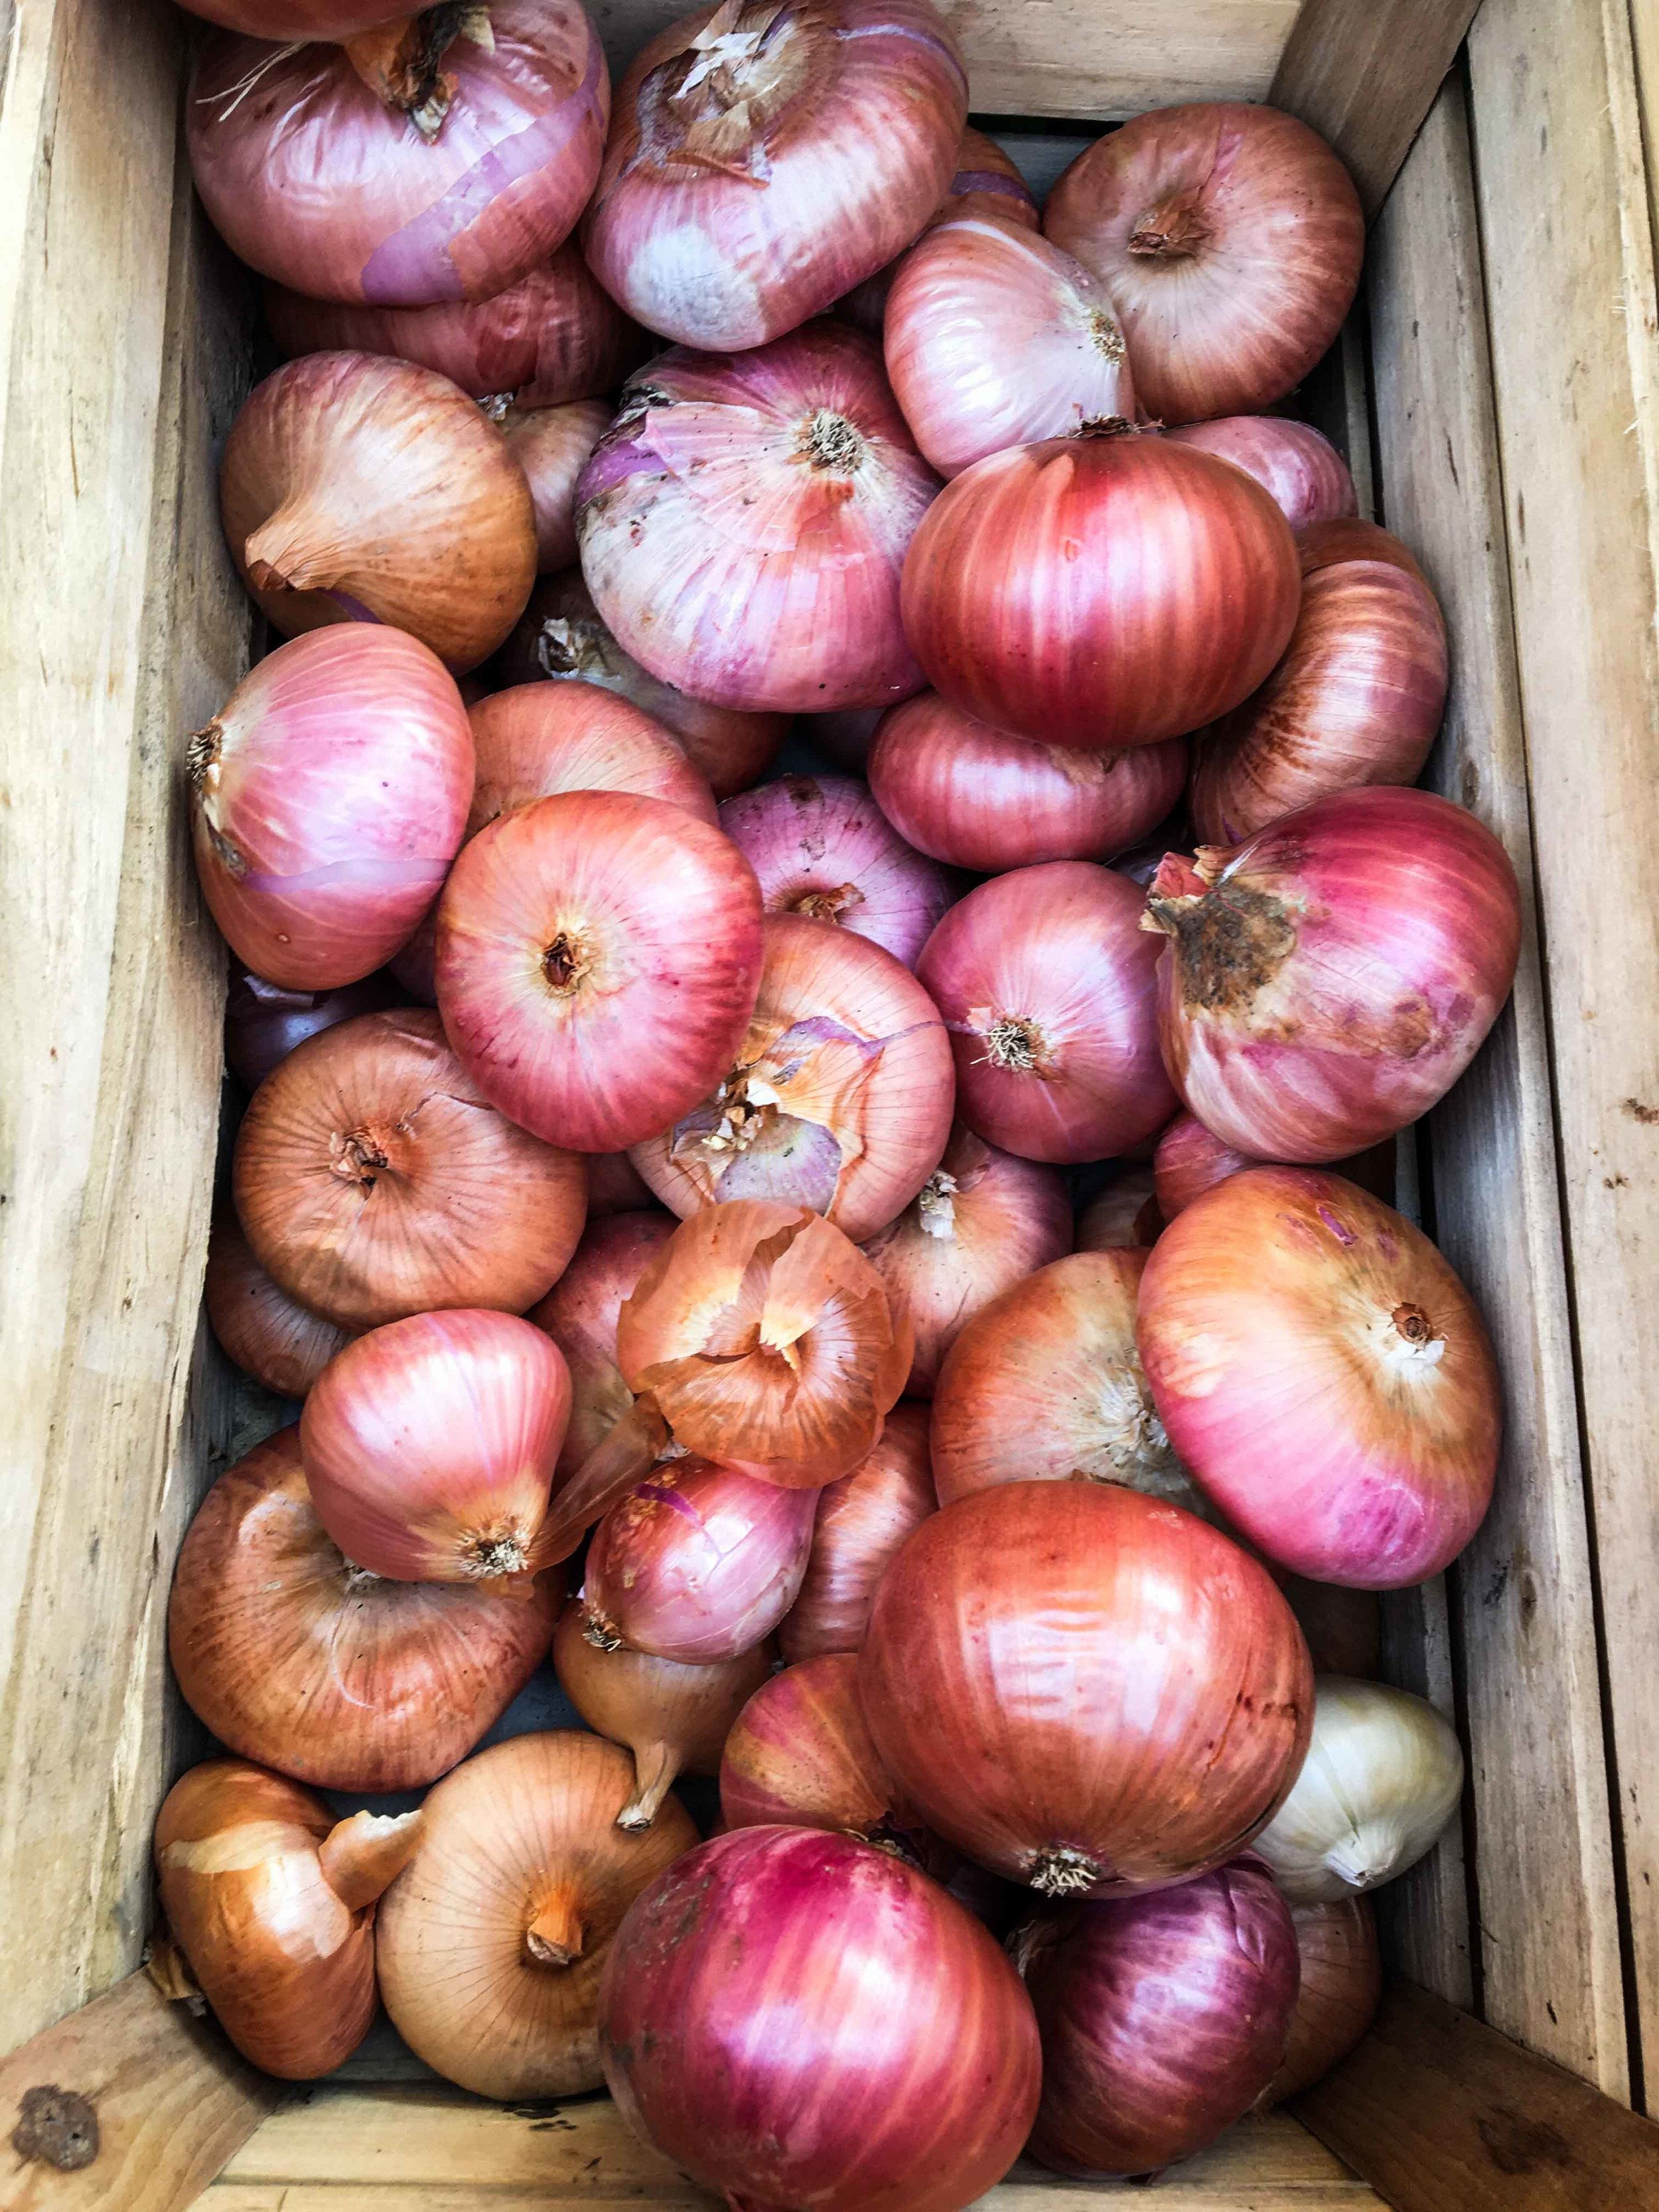 onions from reggio emilia September